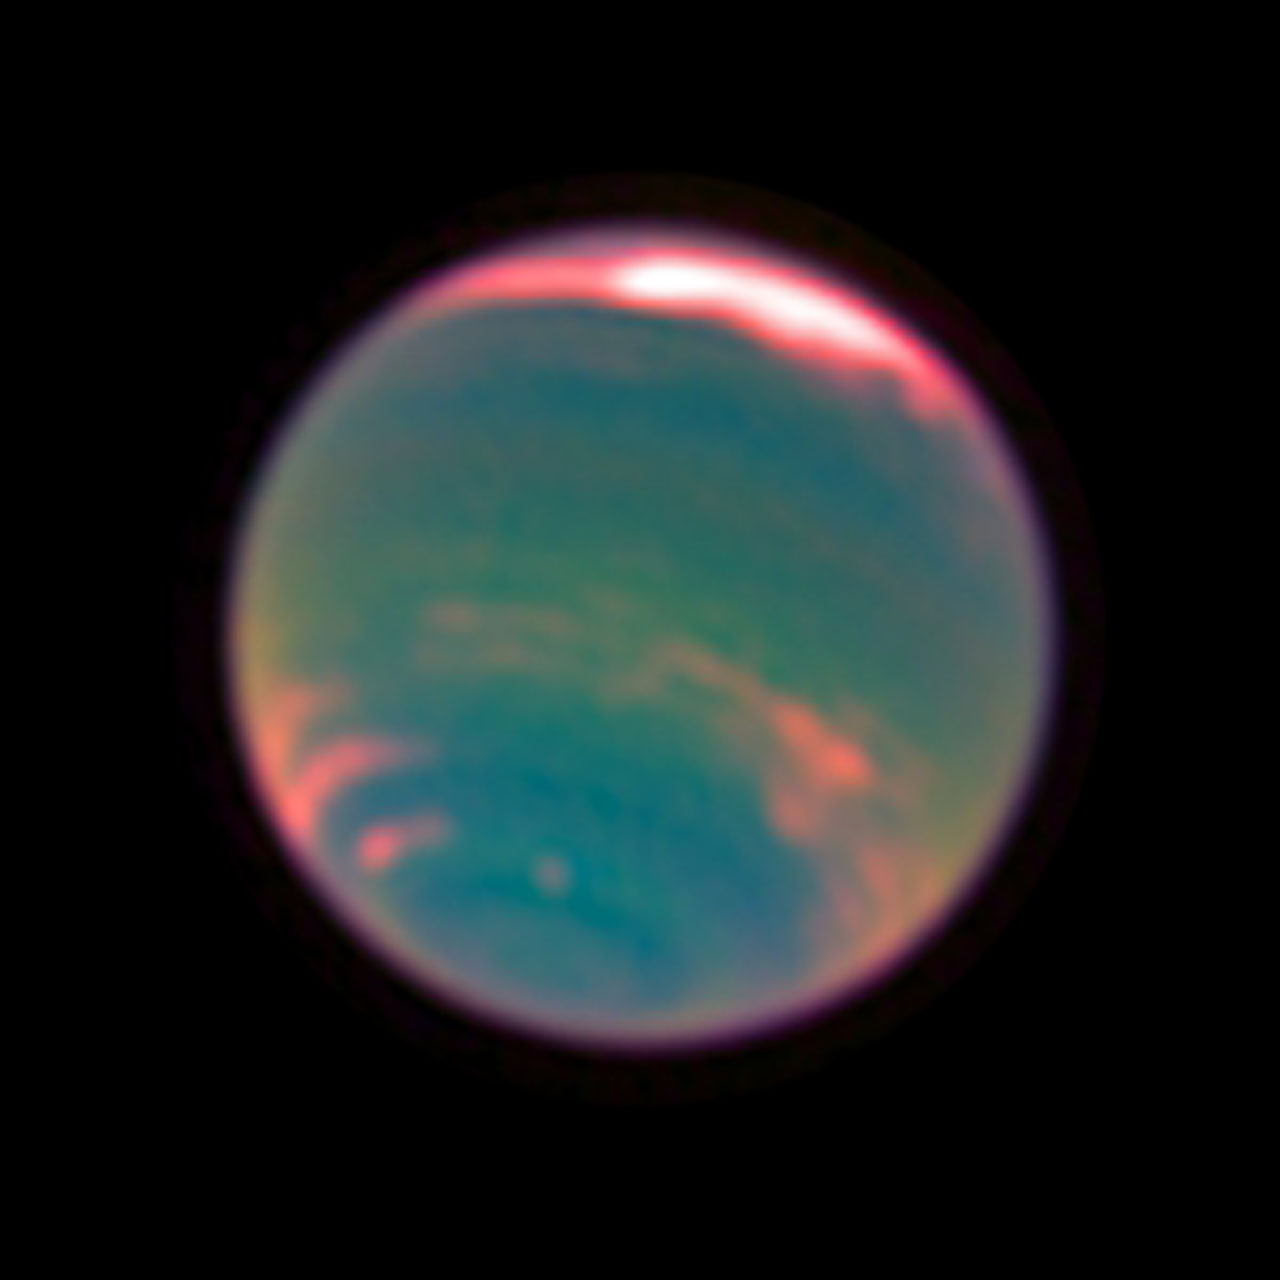 Neptune - Methane Band